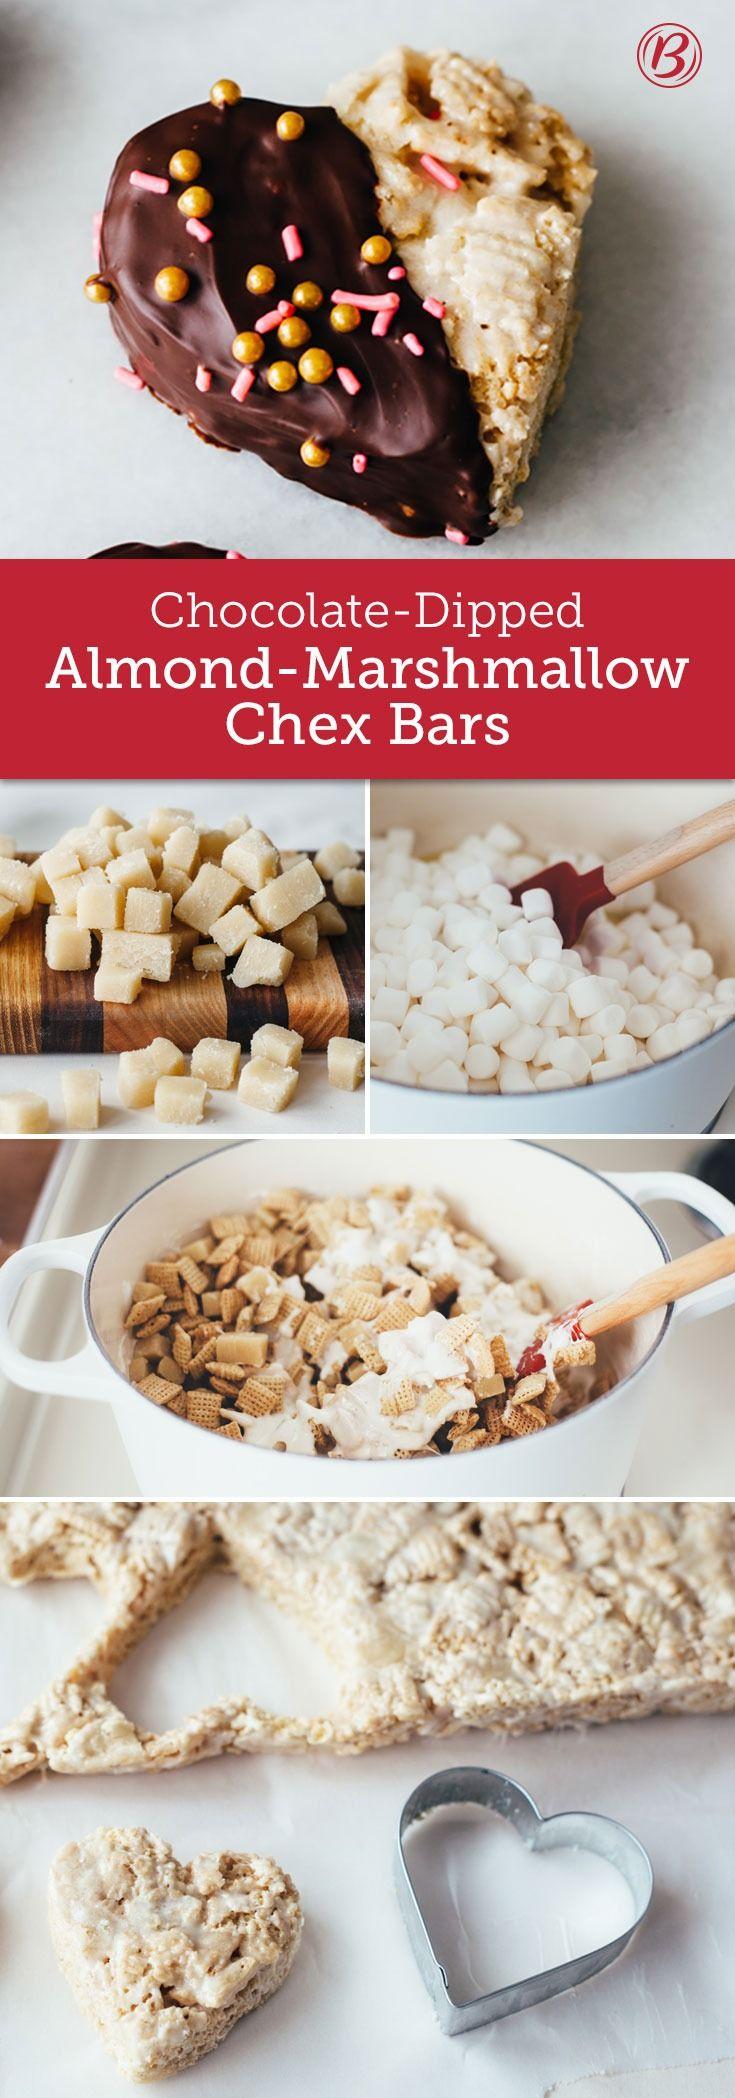 177 best Valentine's Day images on Pinterest | Recipes, Desserts ...